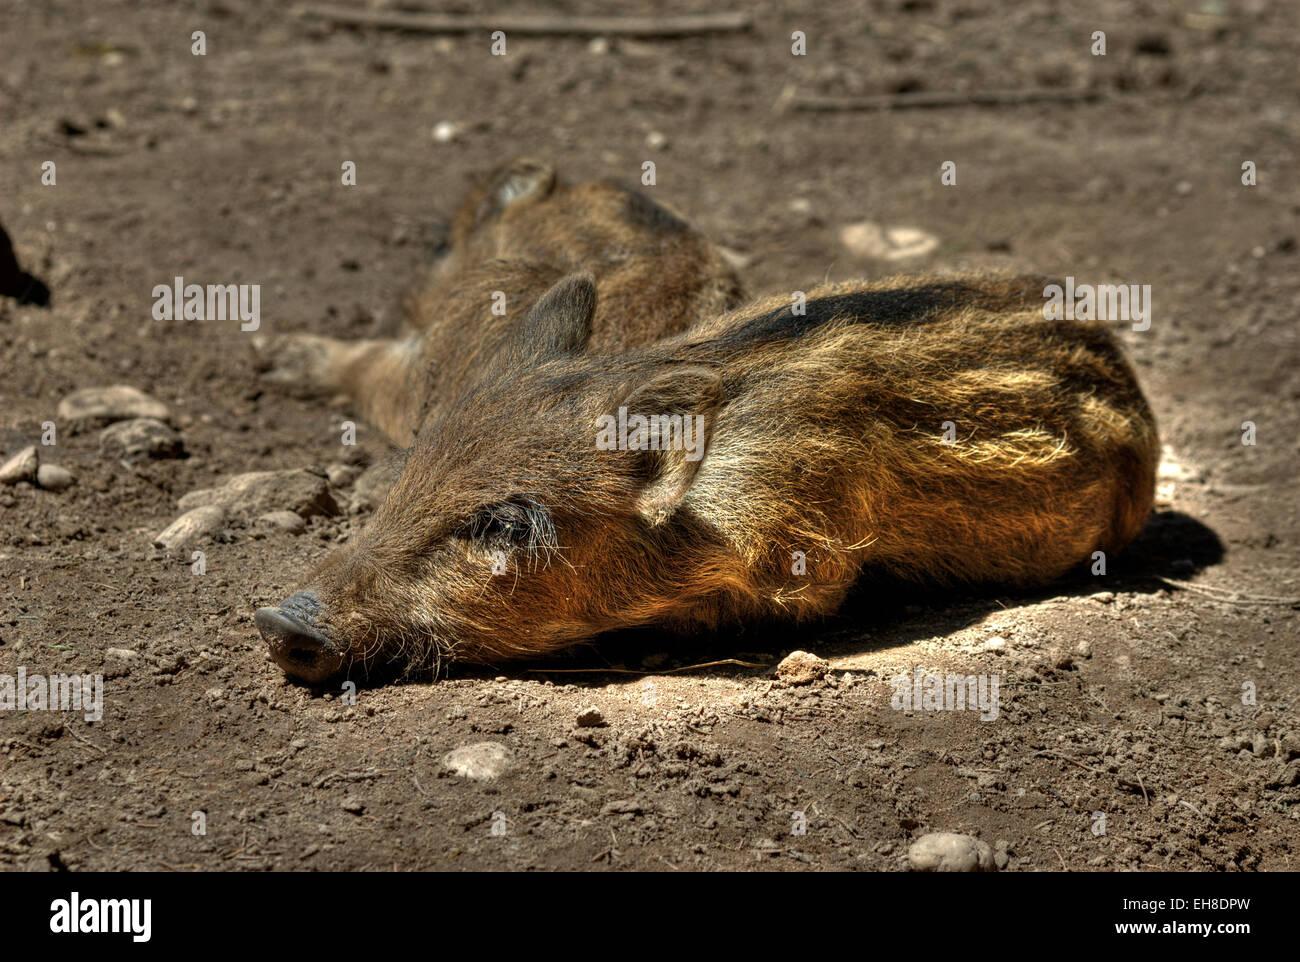 Wild boar (Sus scrofa) piglets sleeping in a dried mud wallow. - Stock Image